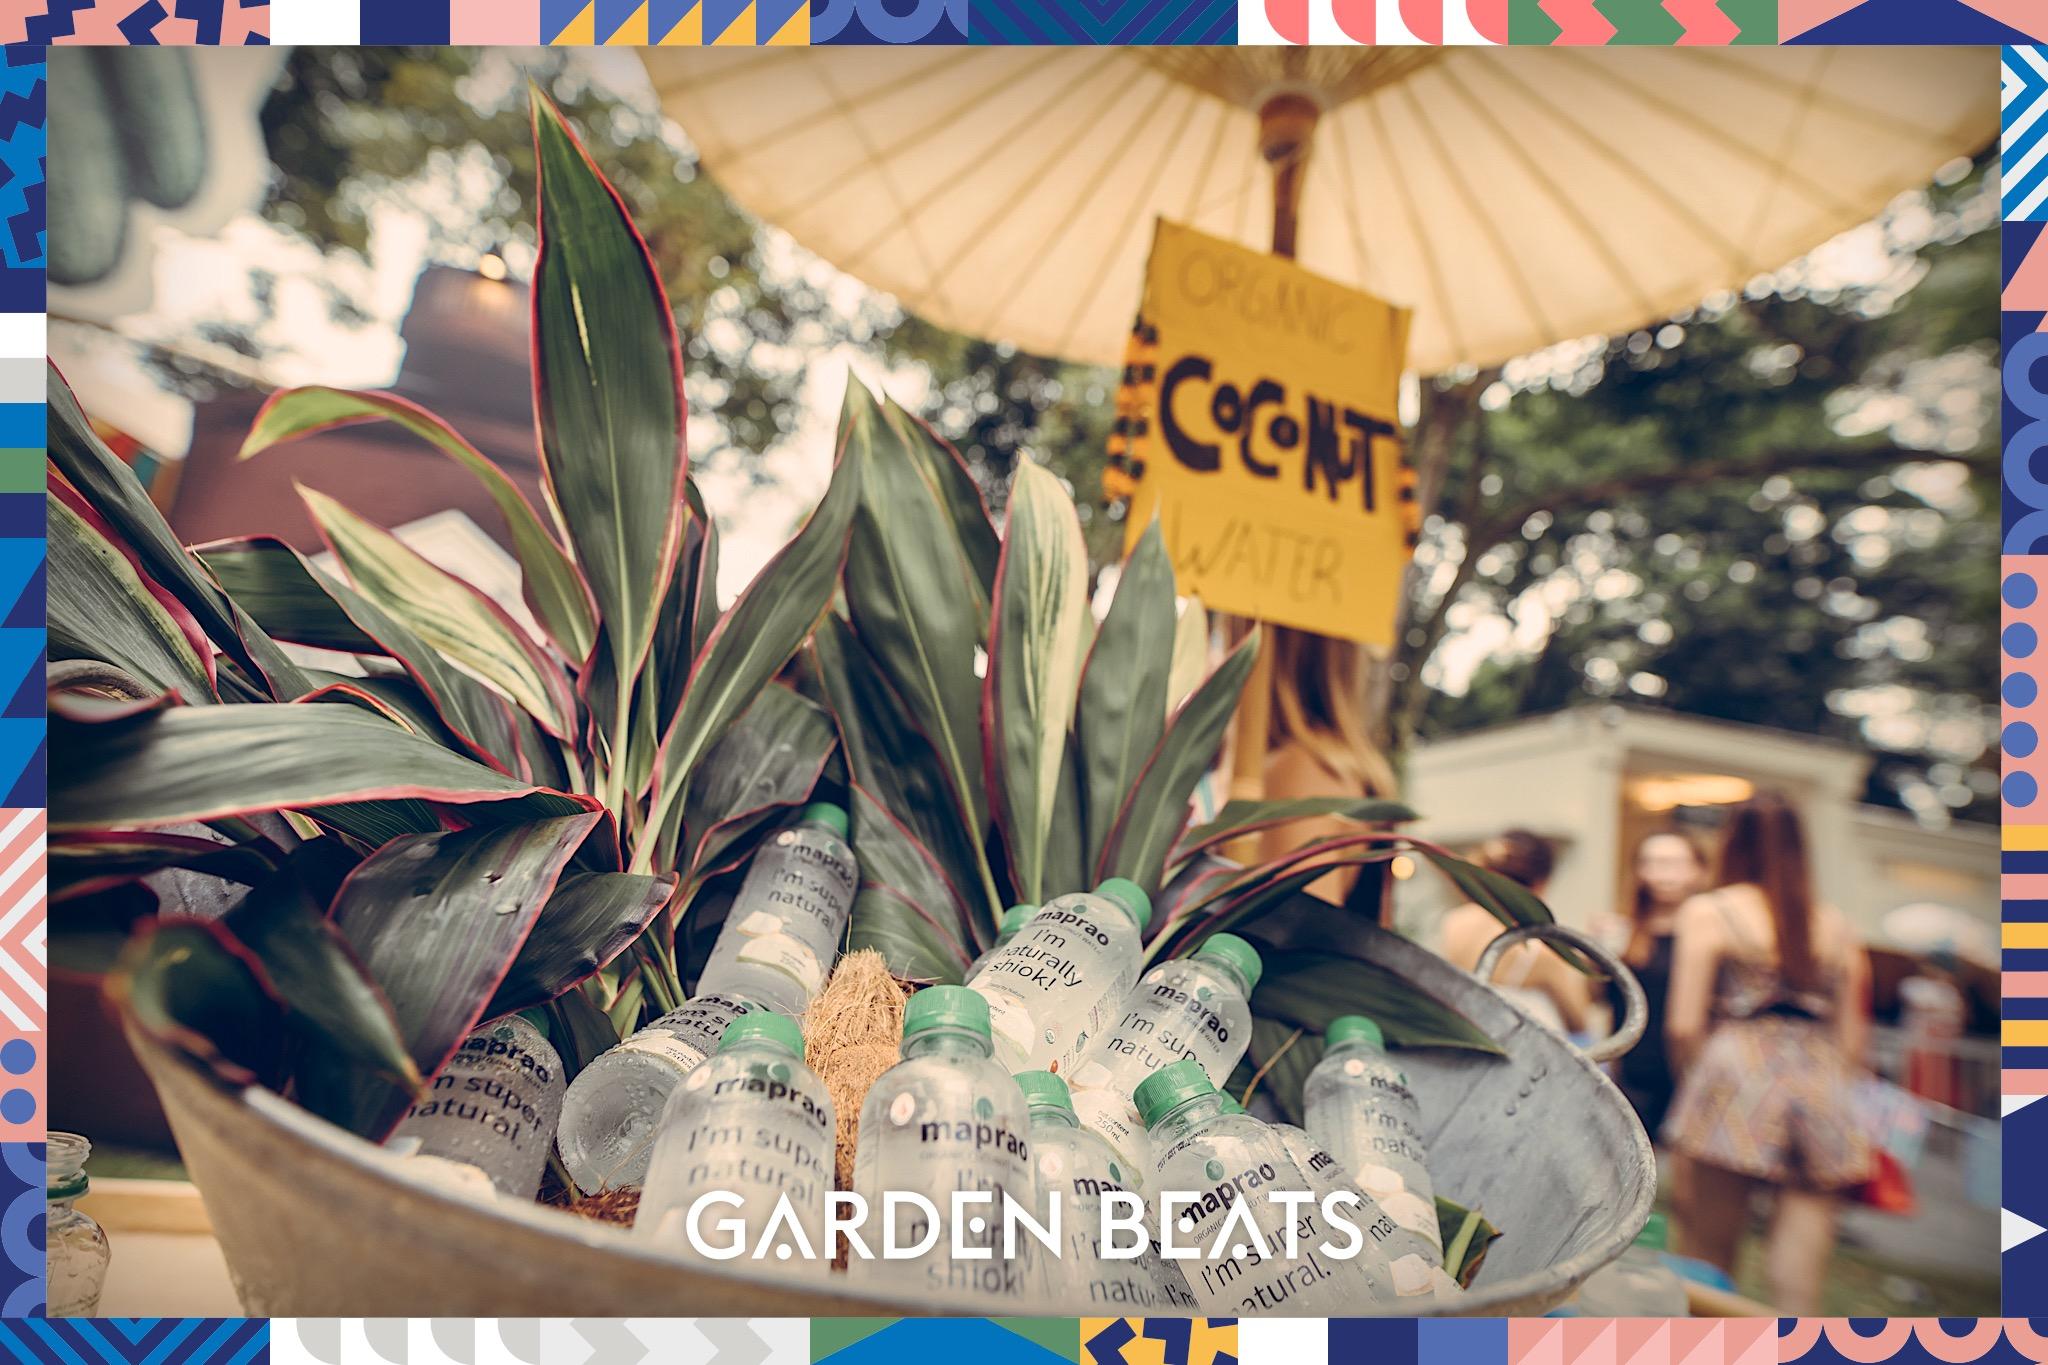 03032018_GardenBeats_Colossal512_Watermarked.jpg